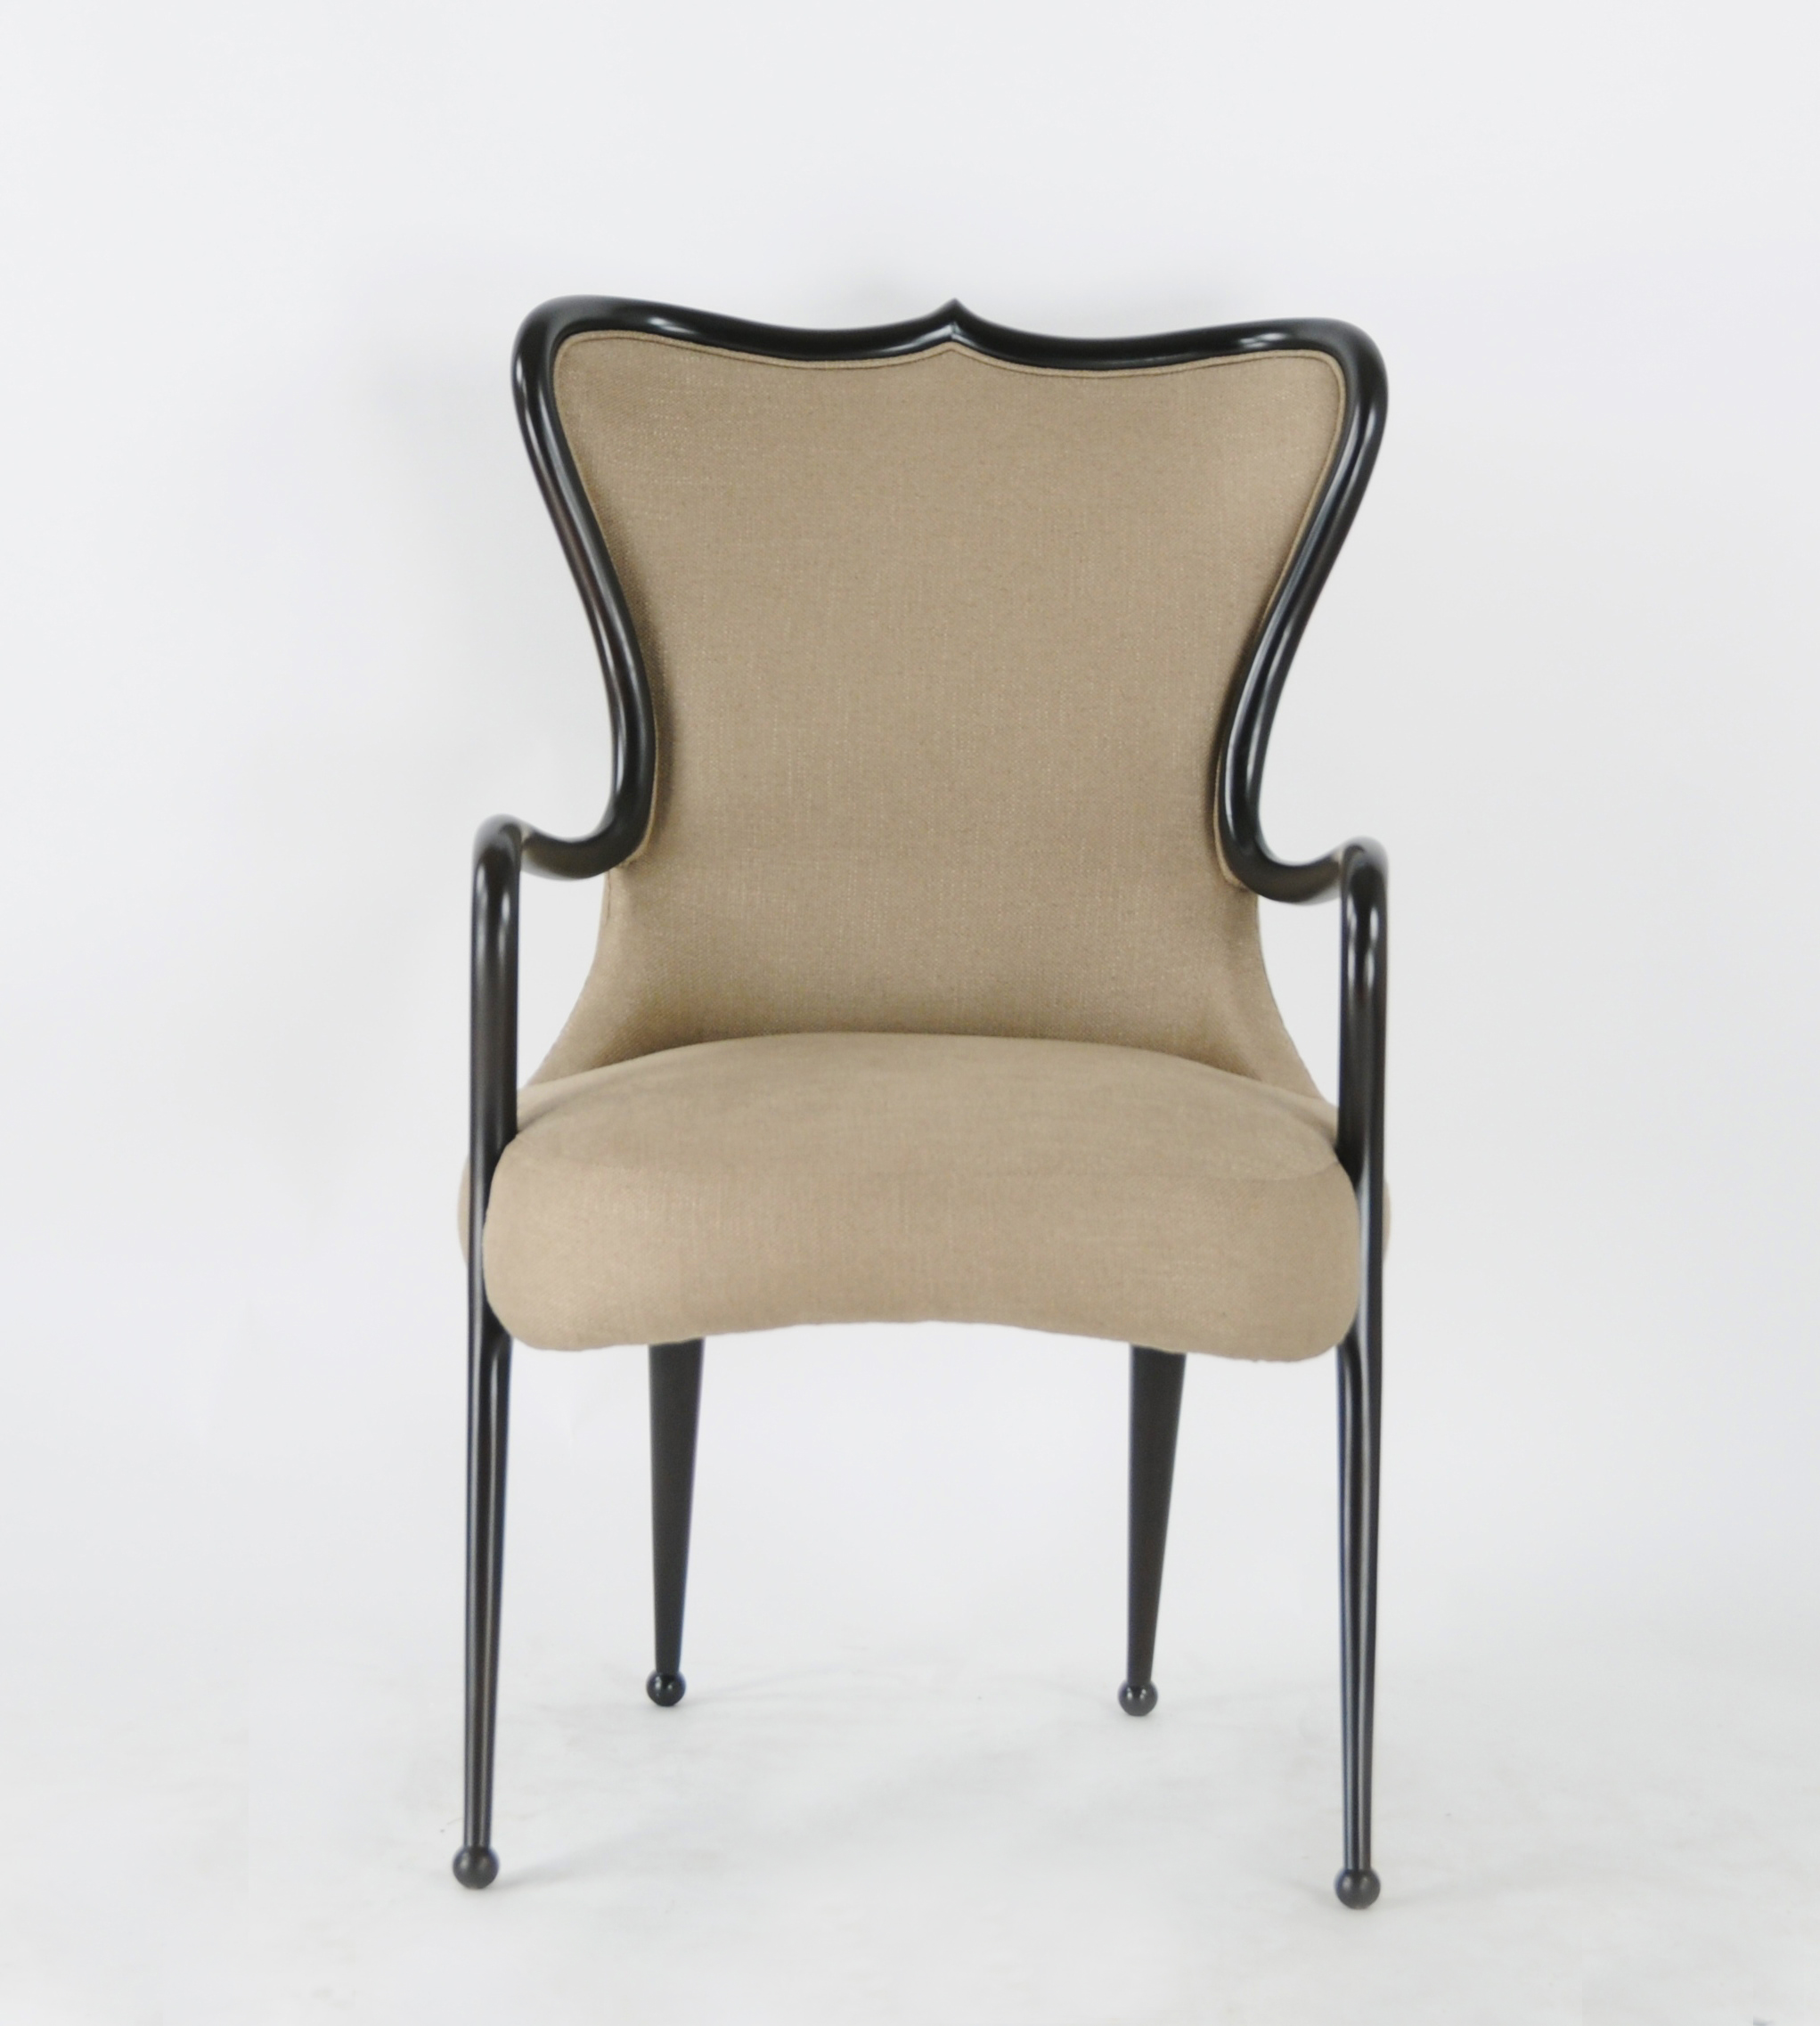 2. MB Dining Chair 'Venezia'.JPG